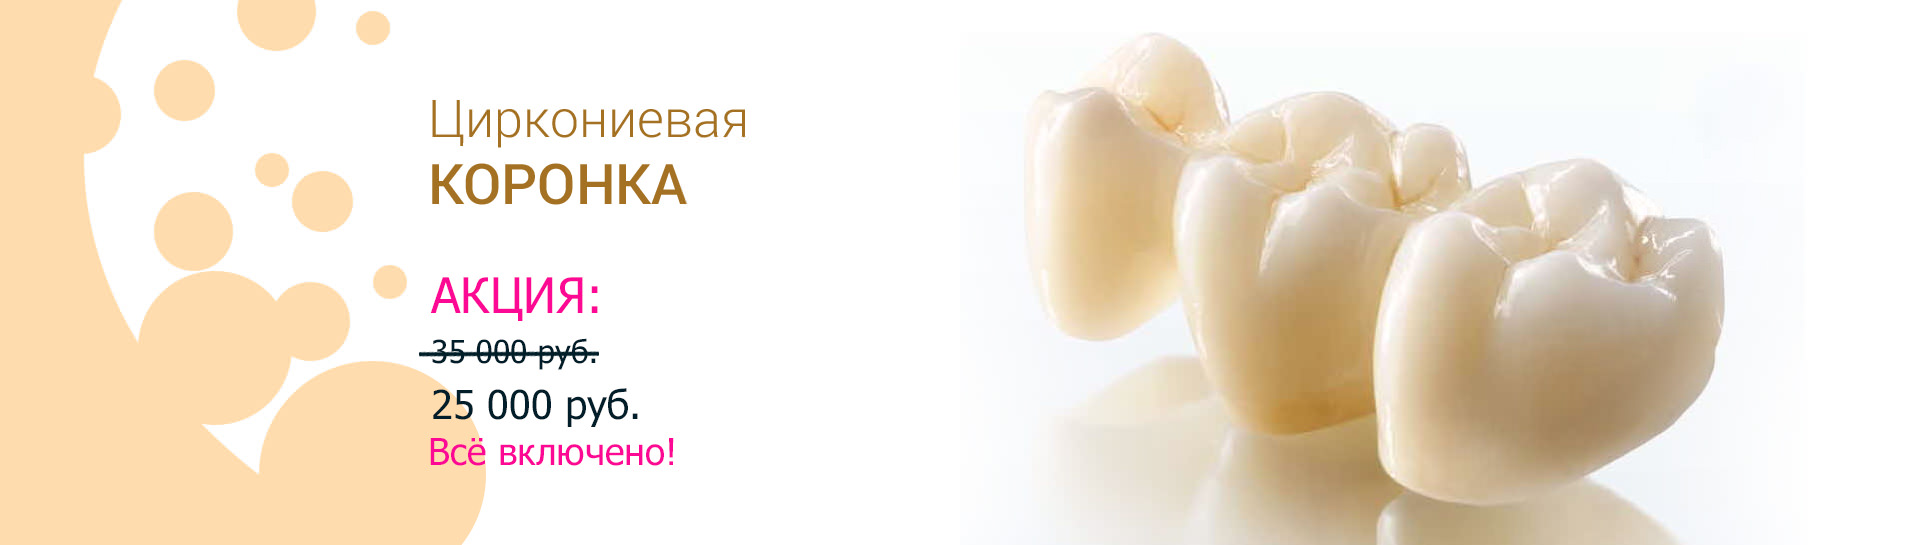 https://denta-maryino.ru/wp-content/uploads/Koronka.jpg 1x, https://denta-maryino.ru/wp-content/cache/thumb/19/27bdf8e06cdad19_1320x545.jpg 1320w